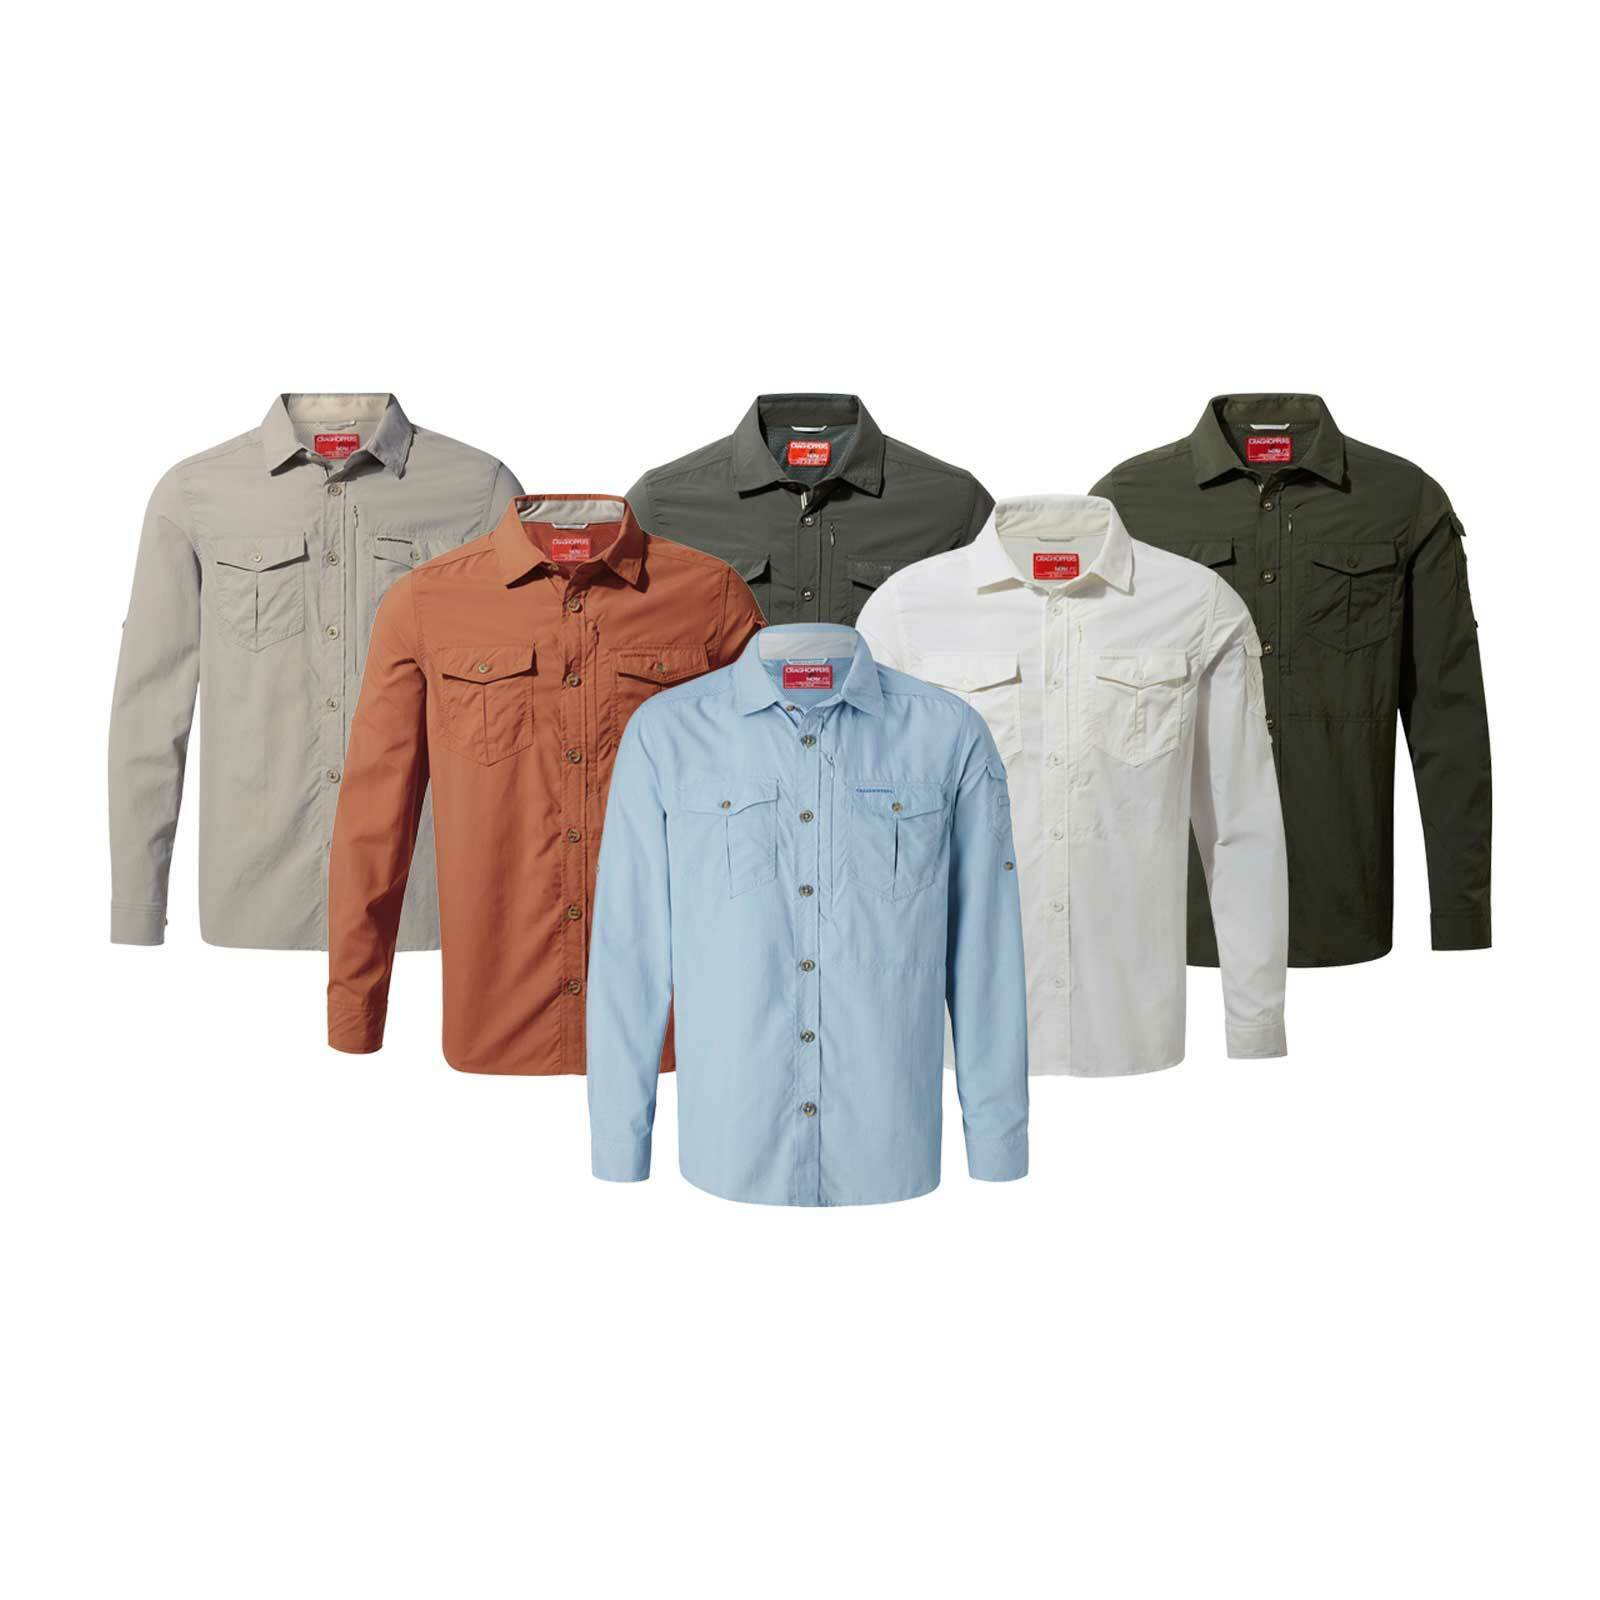 Craghoppers Mens NL ADV Manches Longues-Shirt